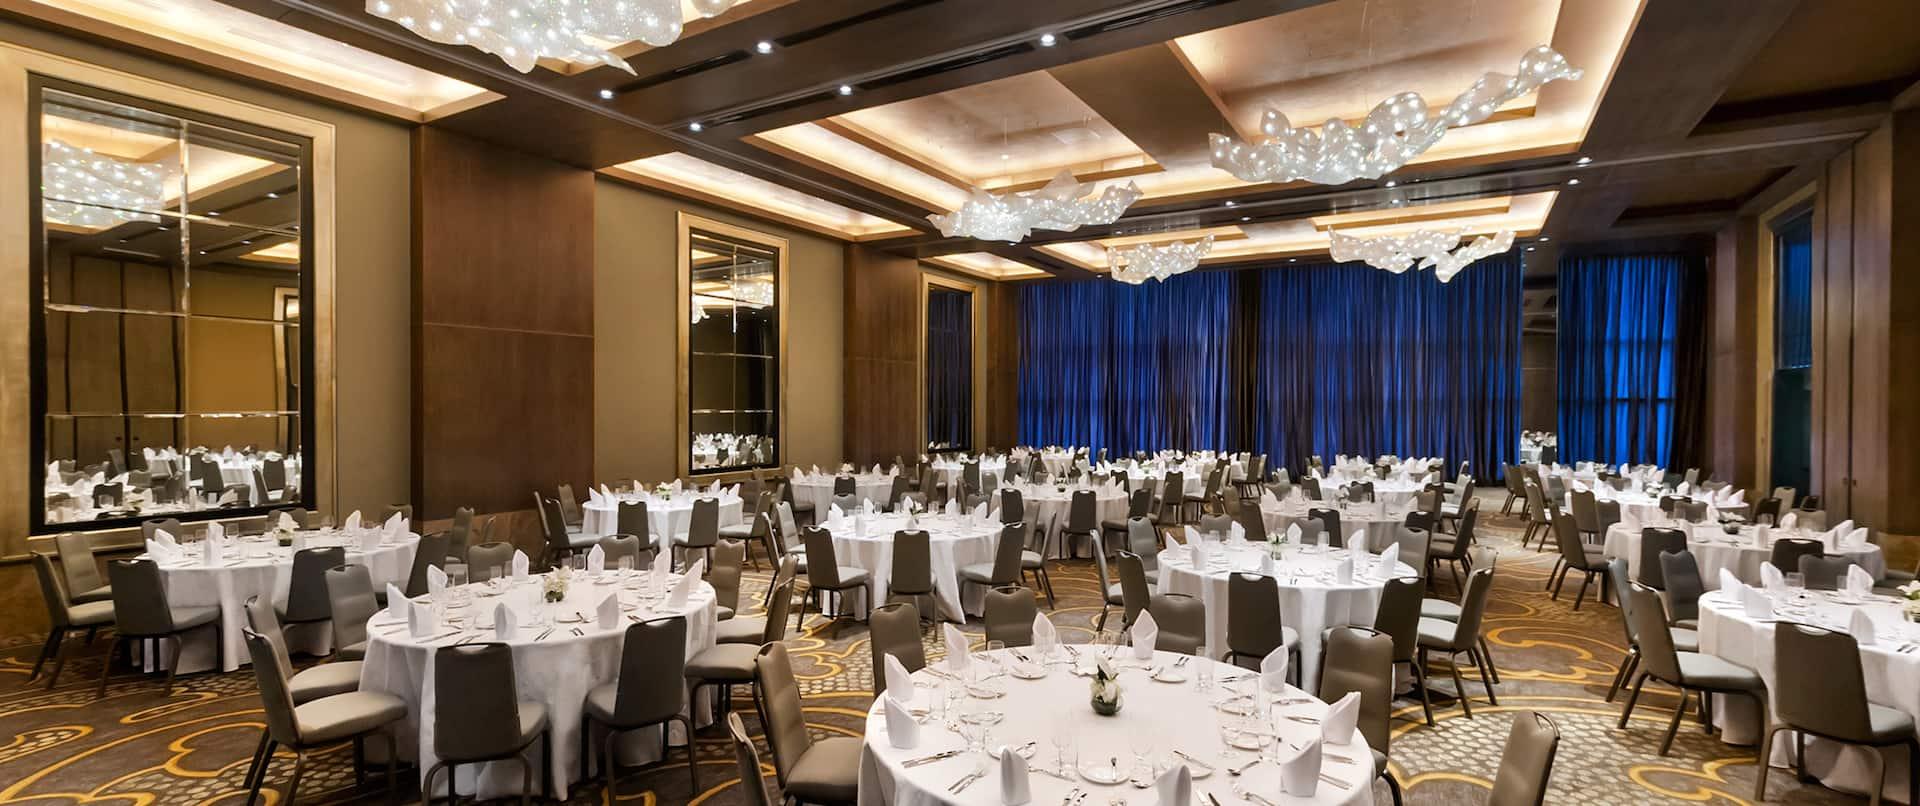 Huascaran Ballroom Banquet Setup